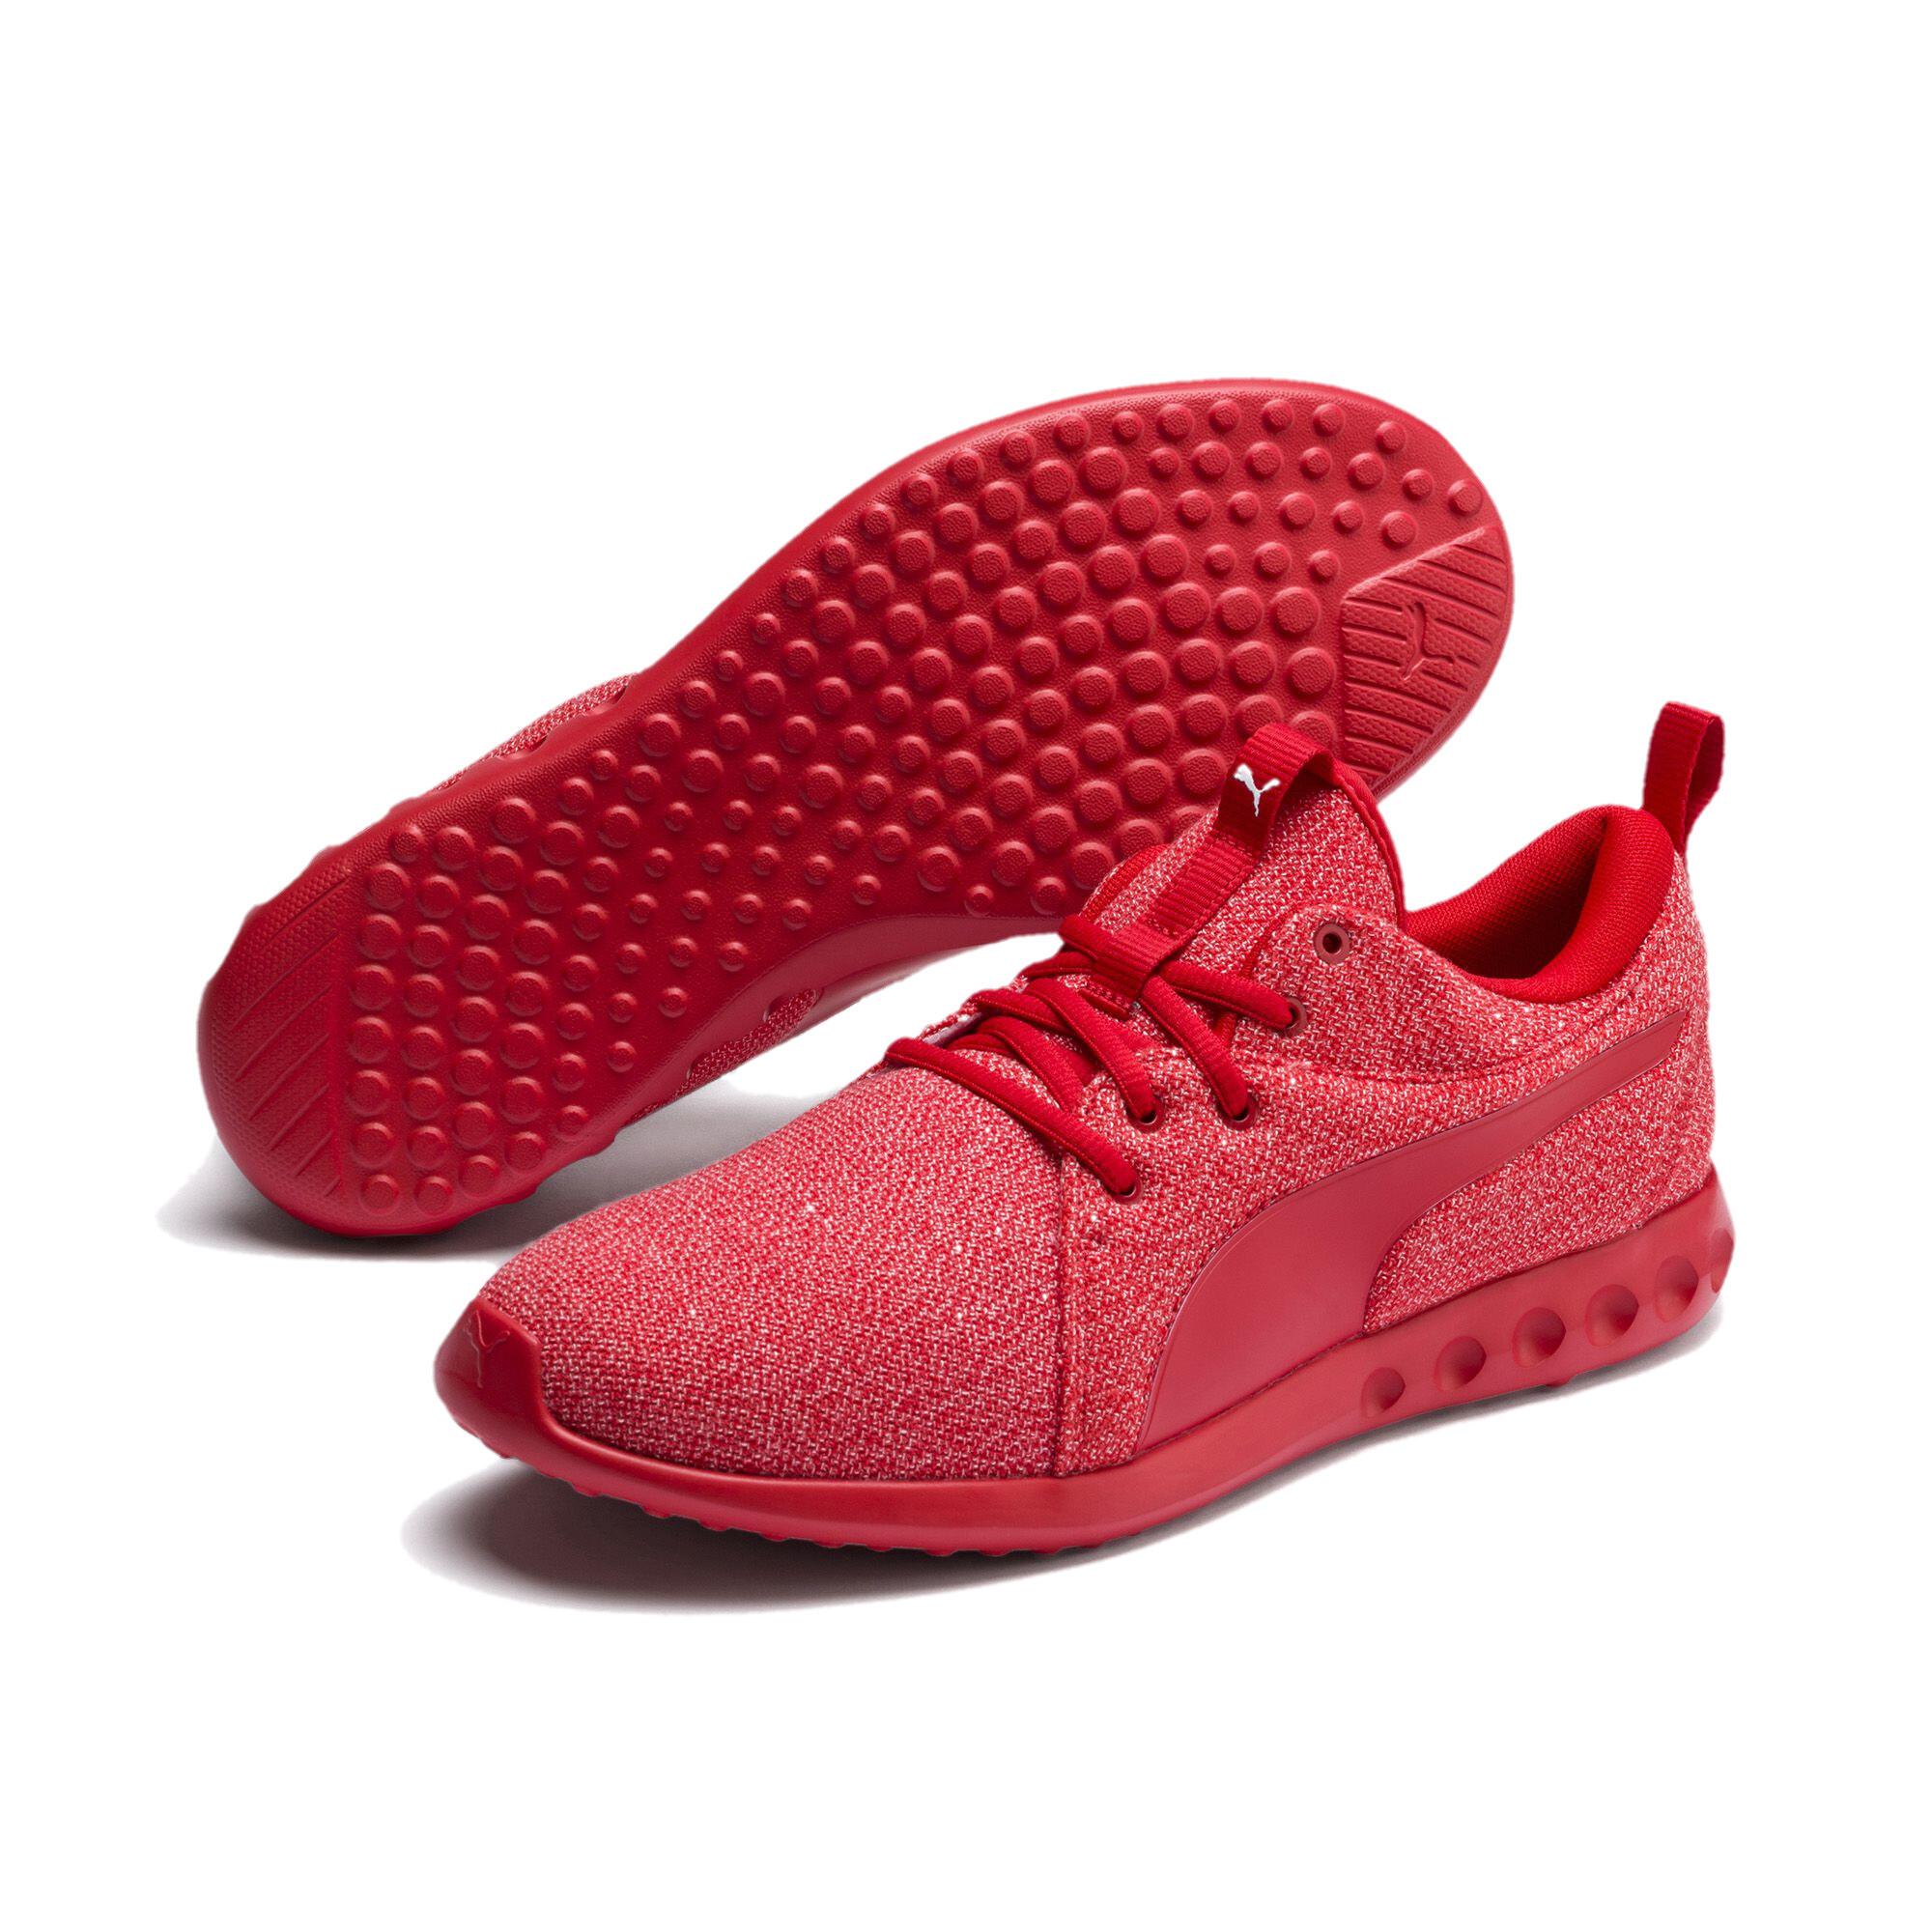 PUMA-Carson-2-Knit-Men-039-s-Training-Shoes-Men-Shoe-Running thumbnail 19